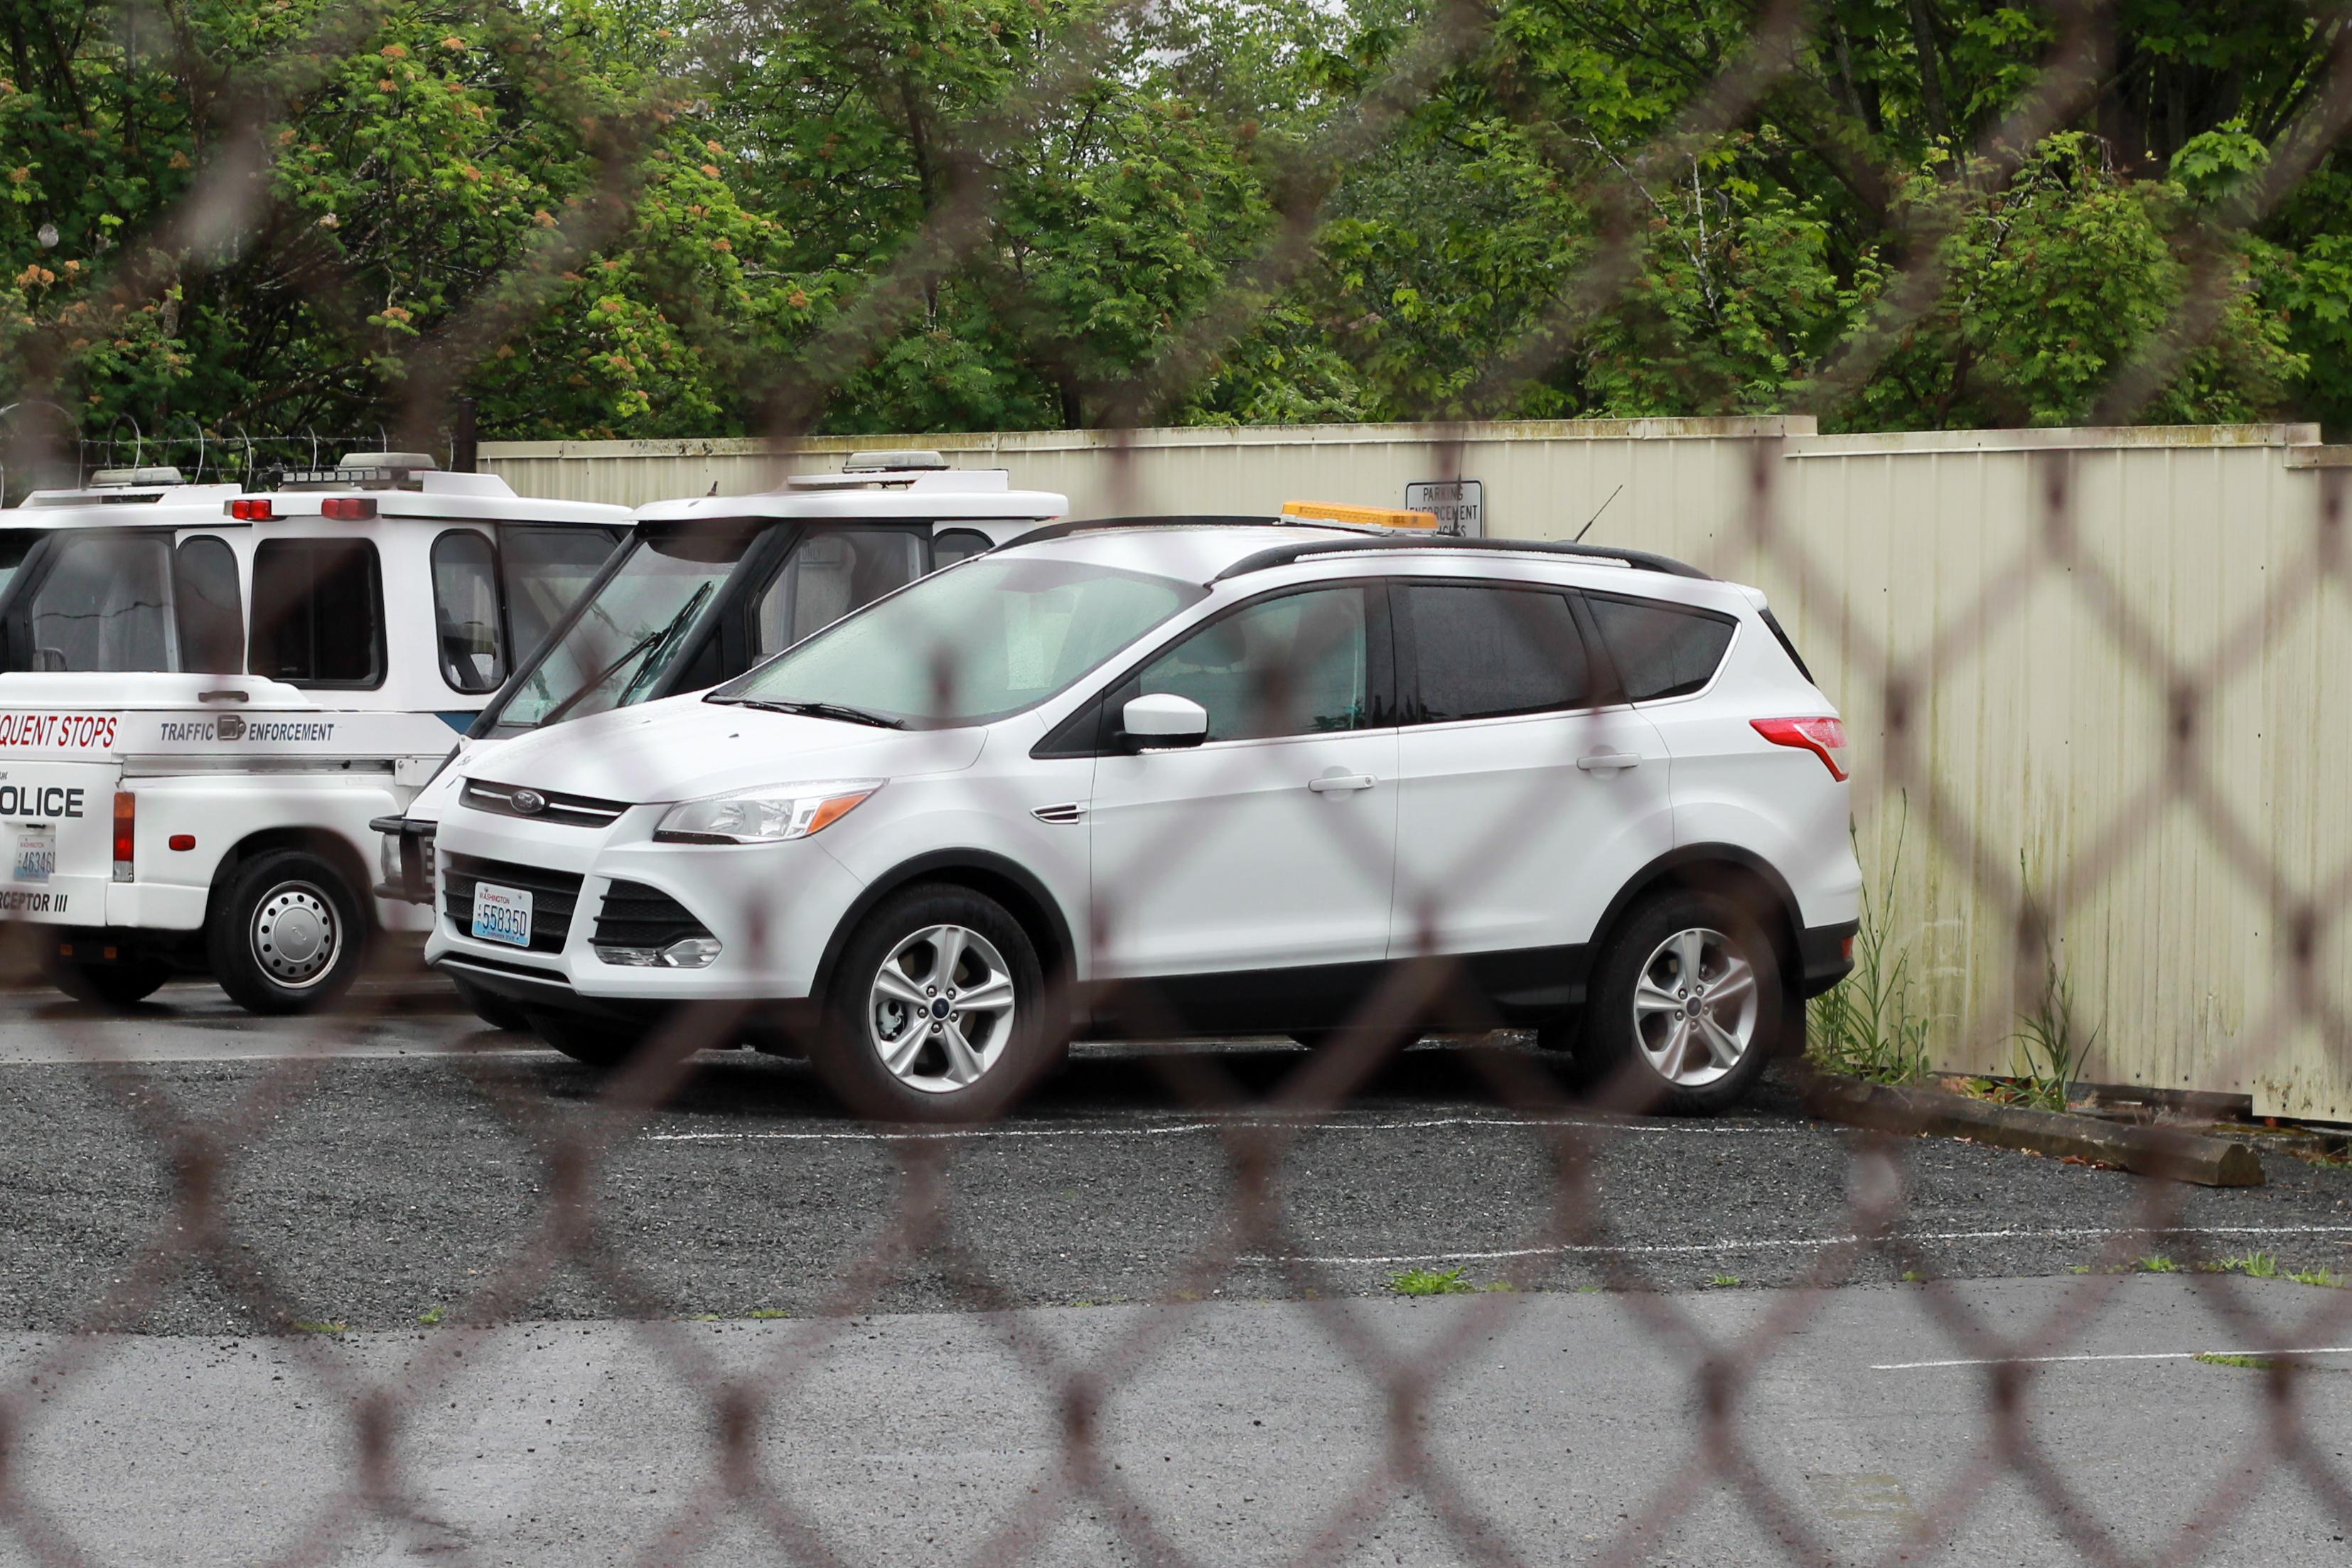 Bellingham police ford escape (parking enforement?) photo